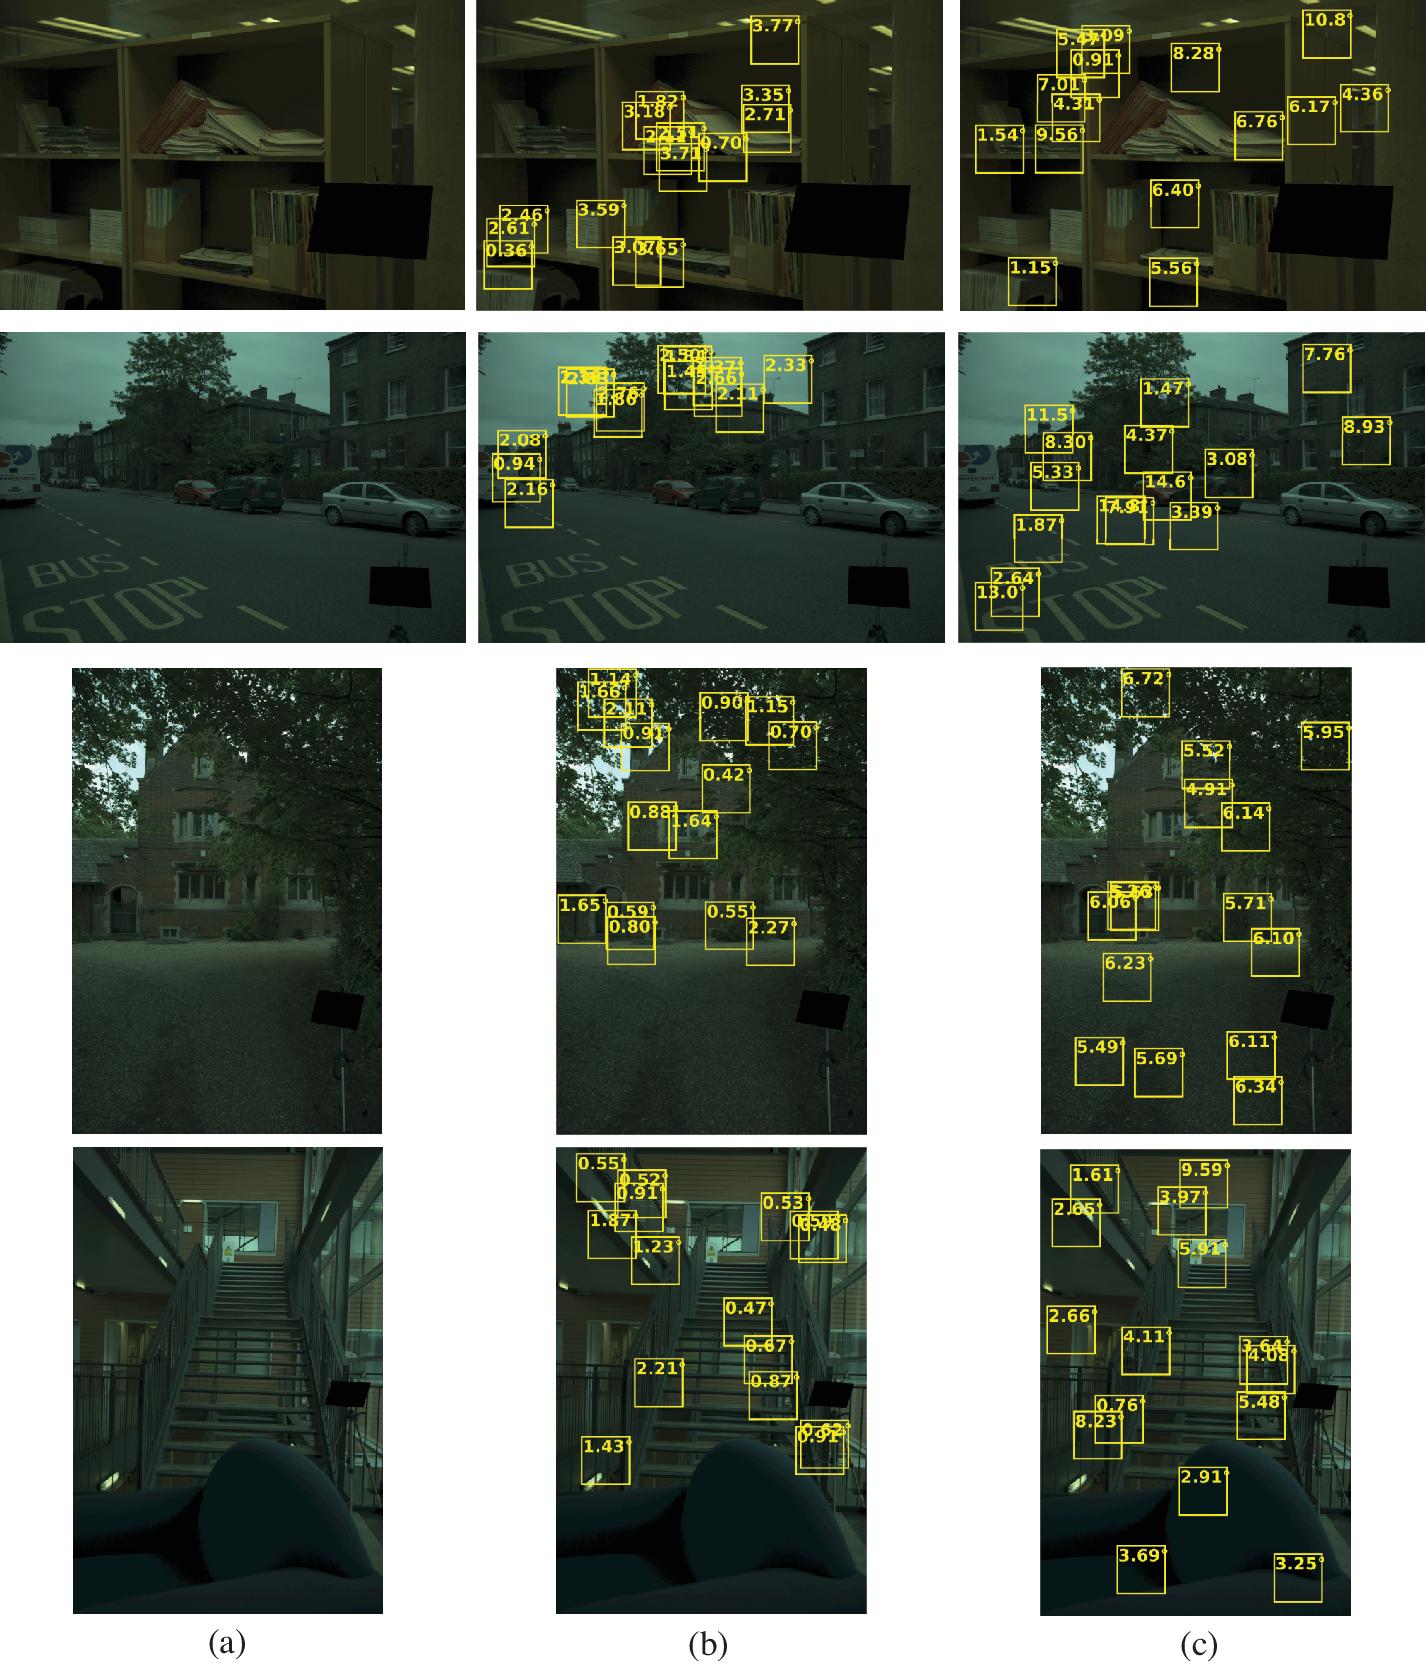 Figure 3 for DeepIlluminance: Contextual Illuminance Estimation via Deep Neural Networks